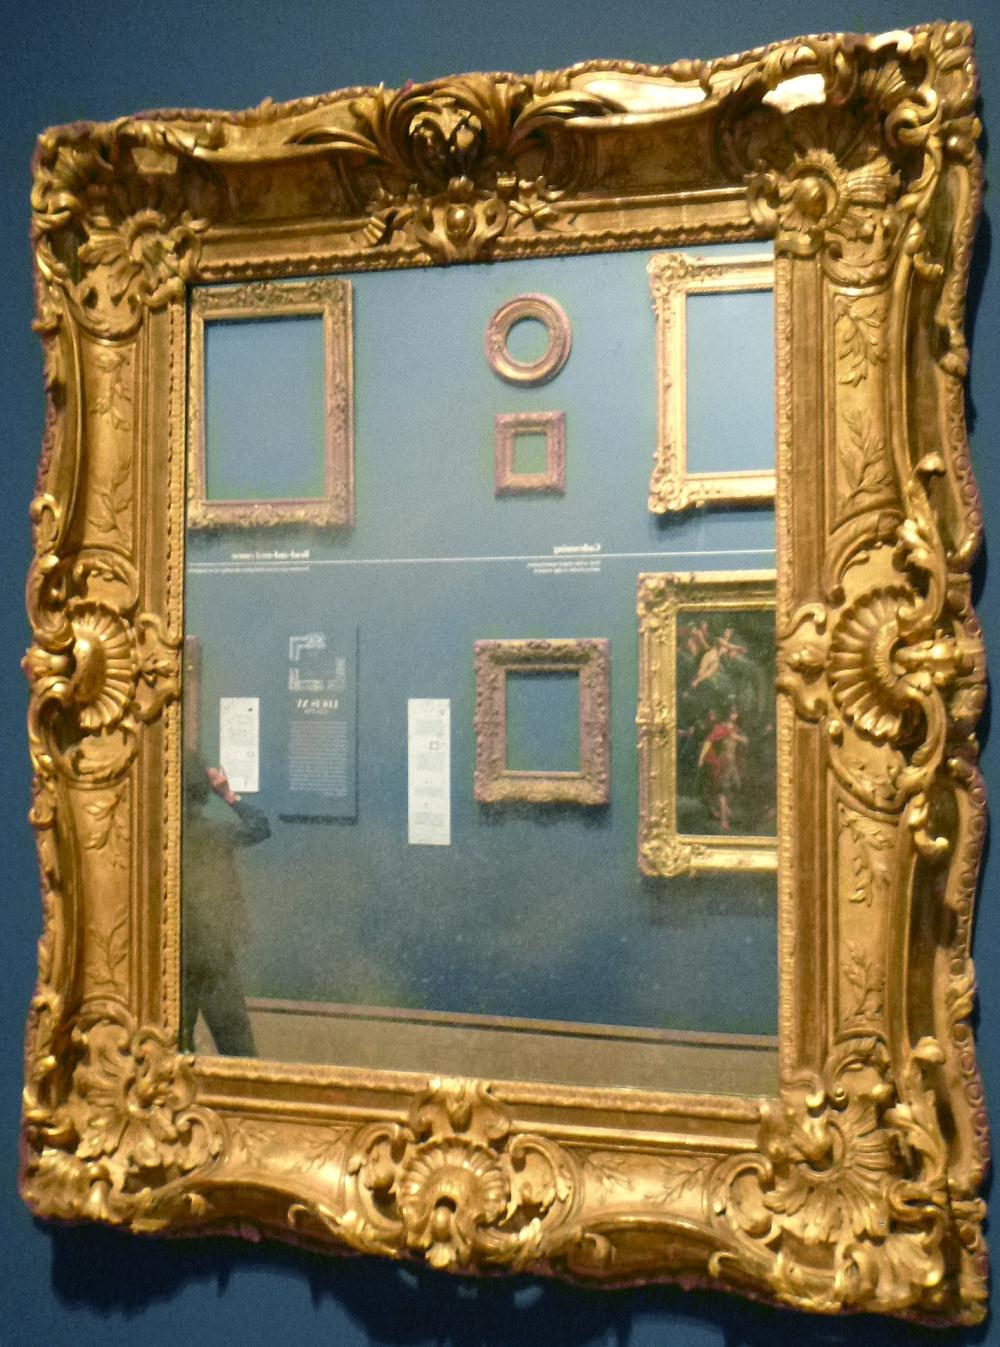 checc81rin-frame-c1770-getty-museum.jpg